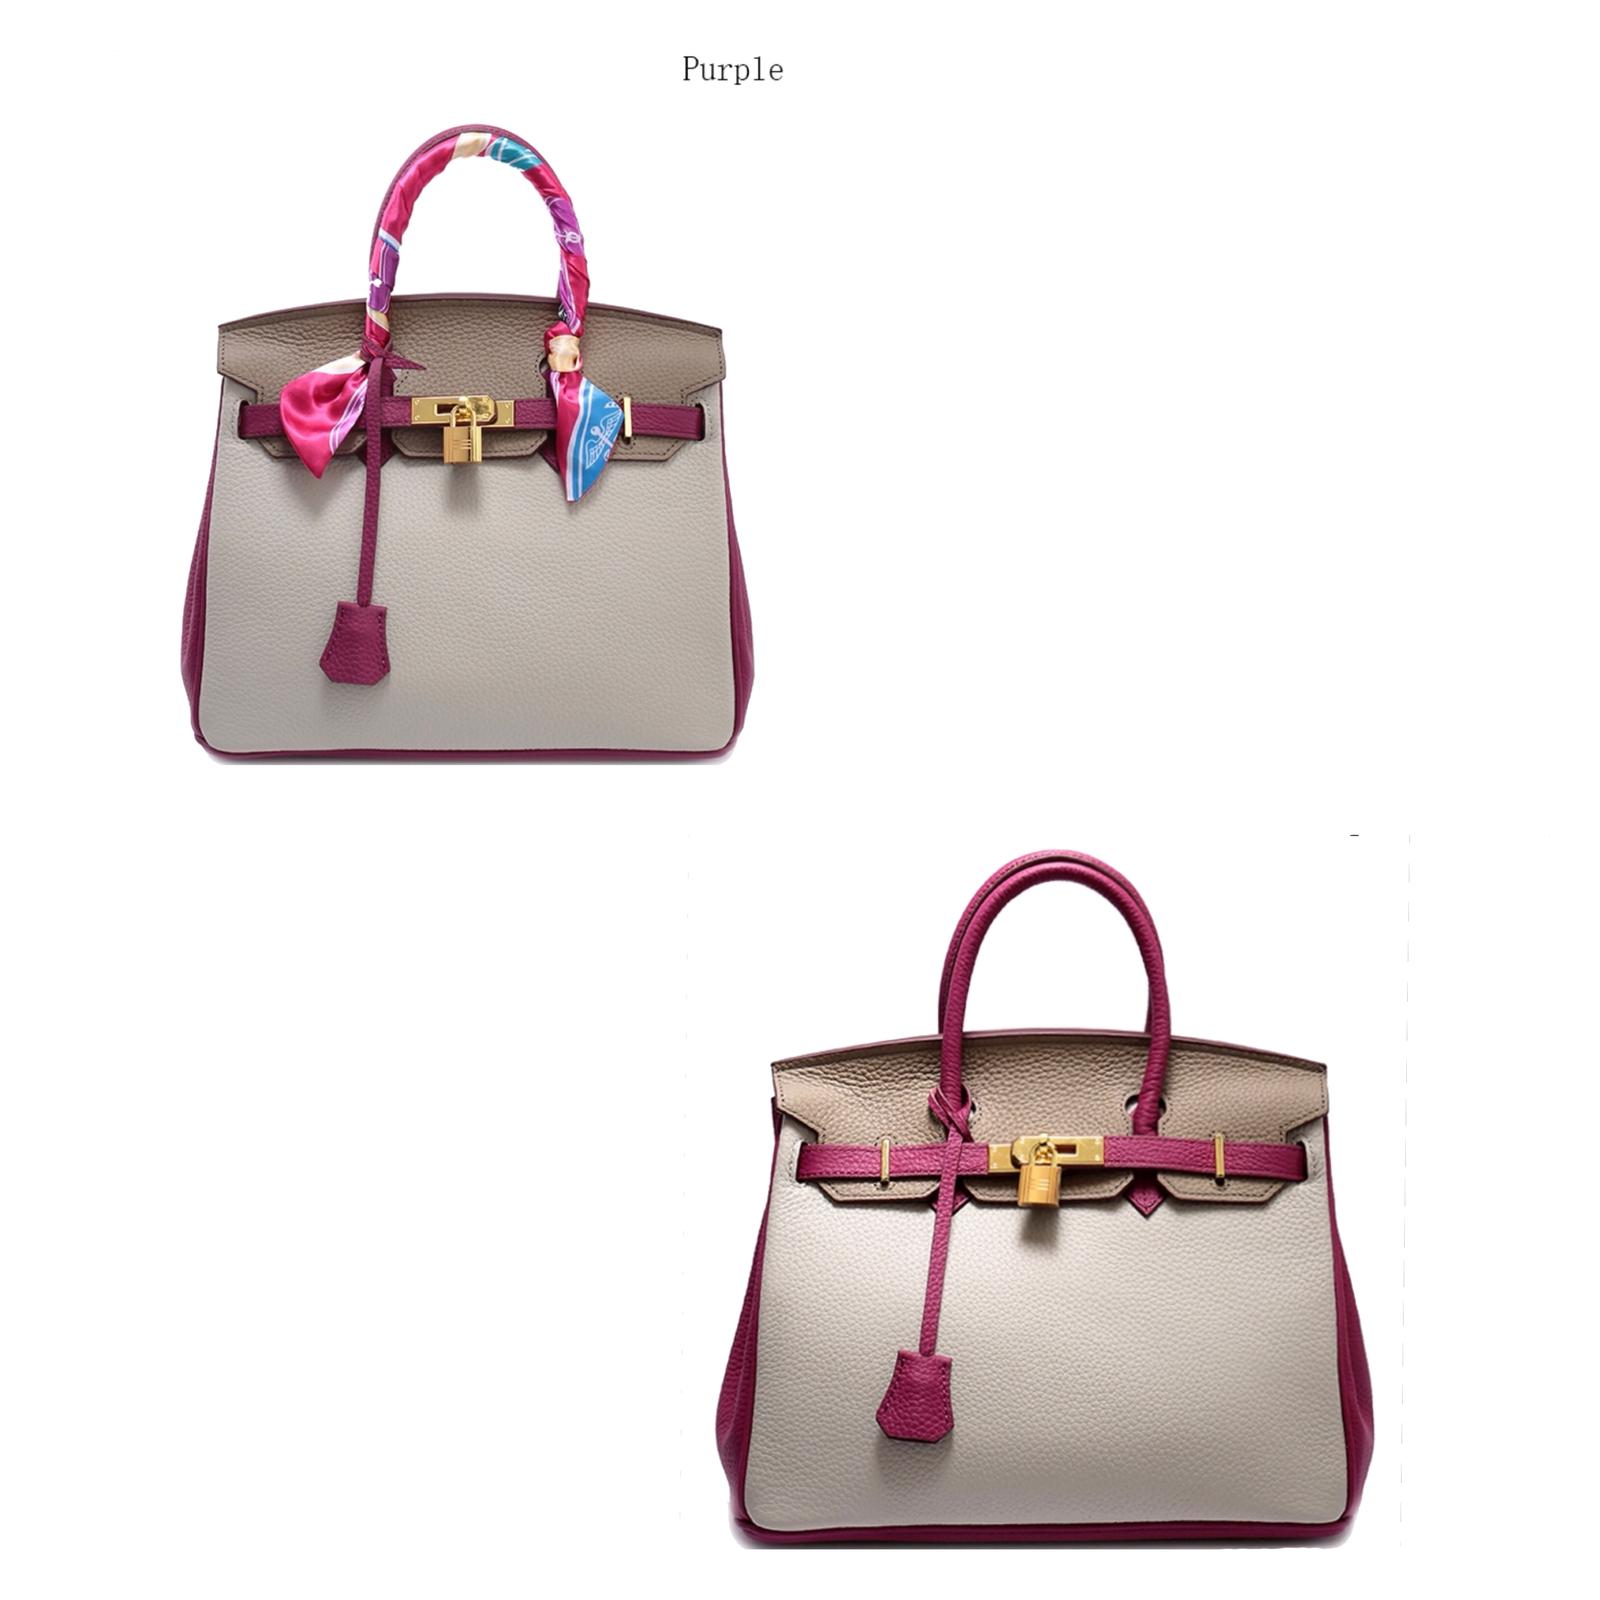 25cm Color Block Pebbled Italian Leather Birkin Style Satchel Handbag